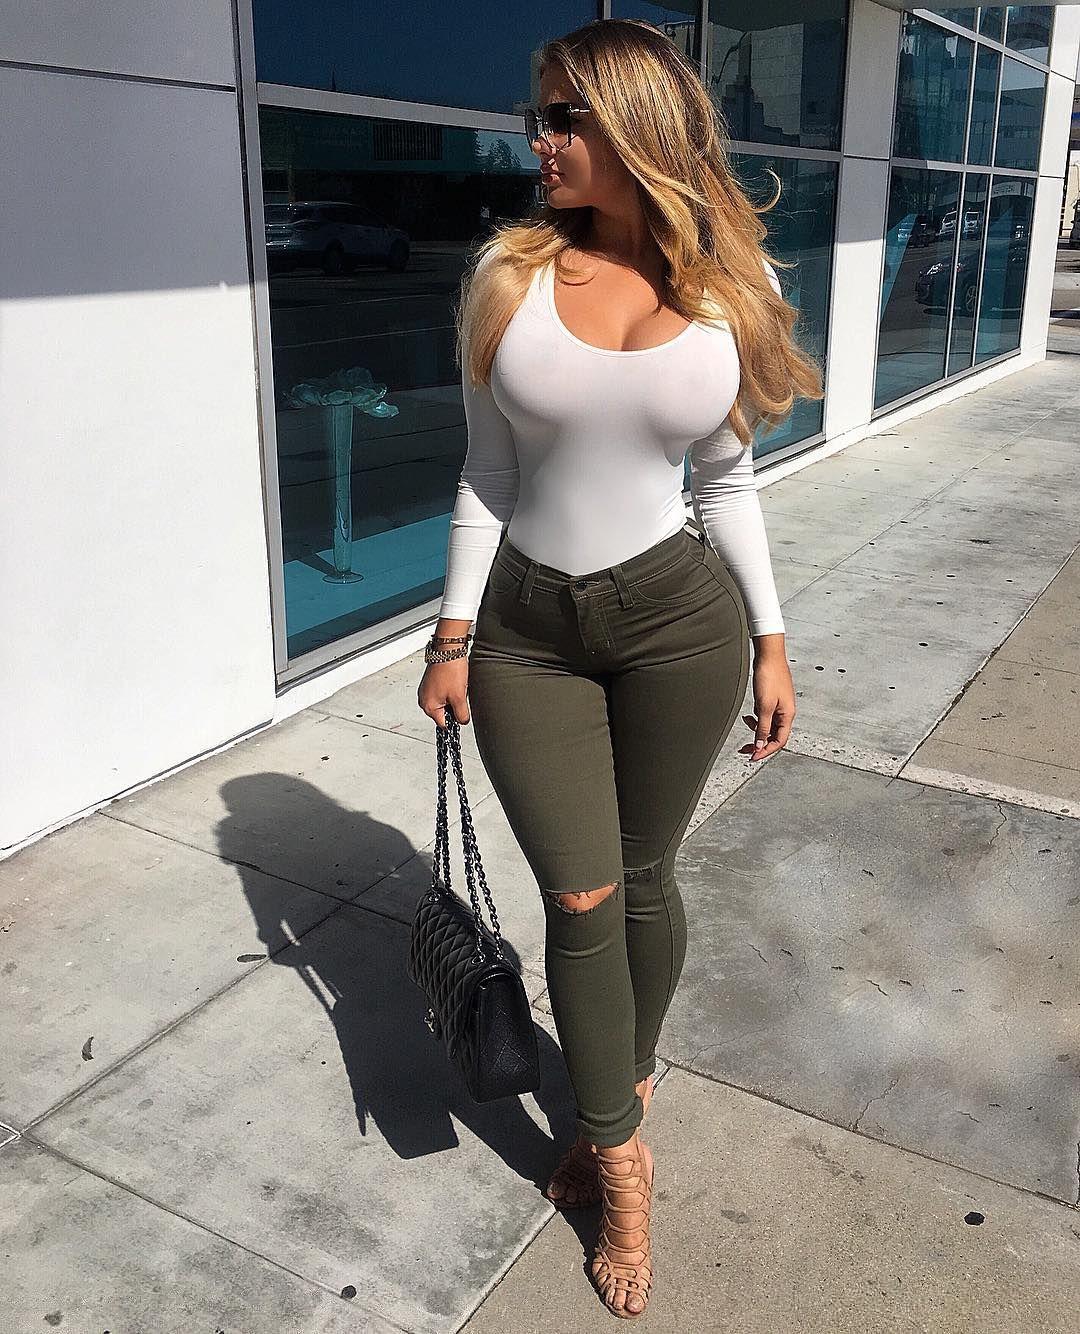 Amateur wife bouncing tits